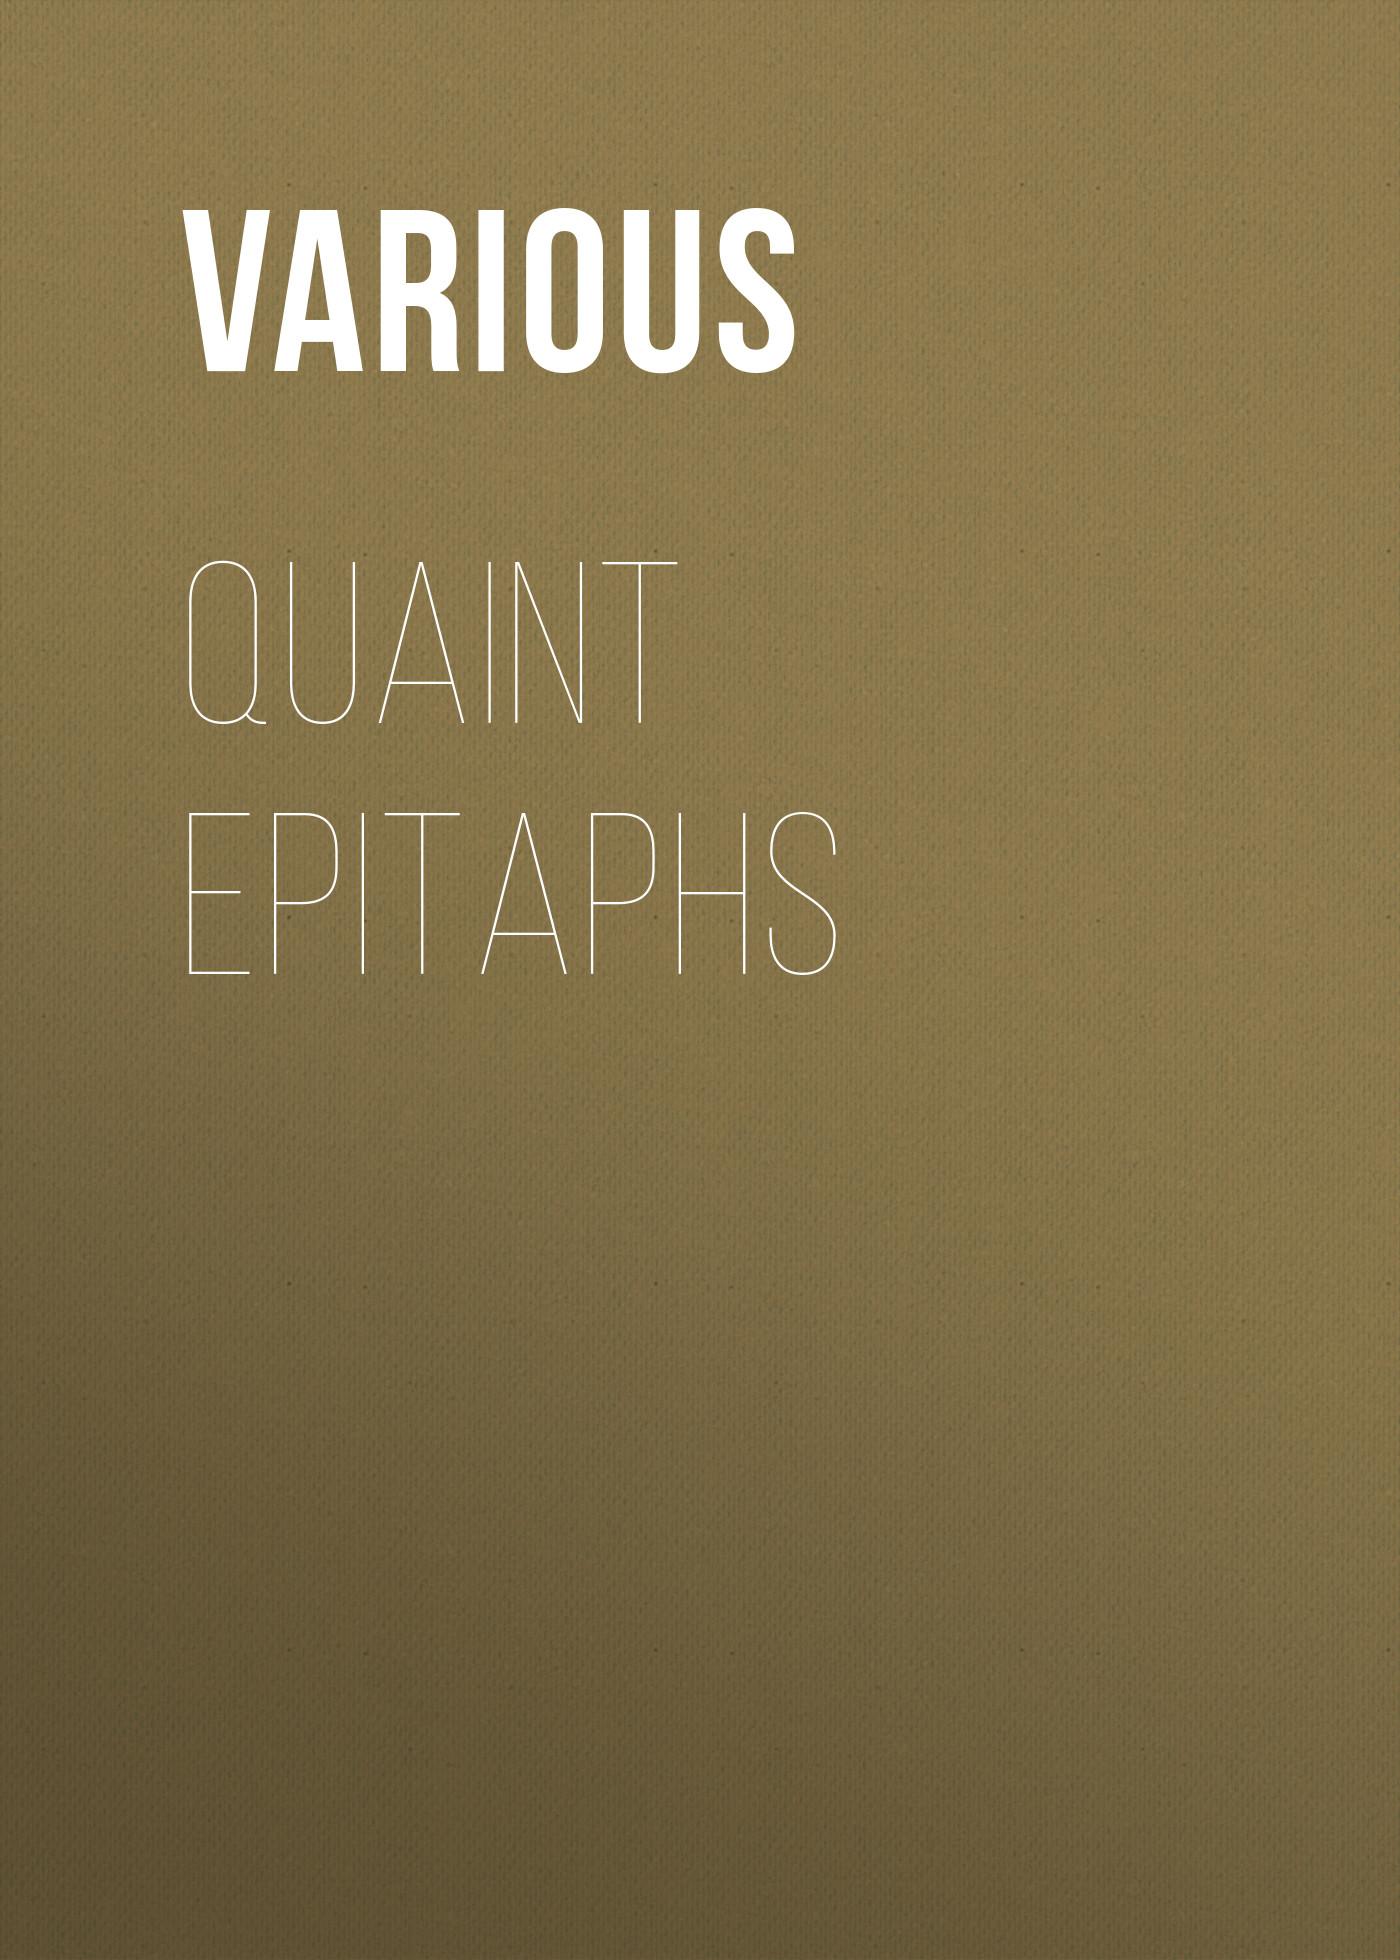 Quaint Epitaphs